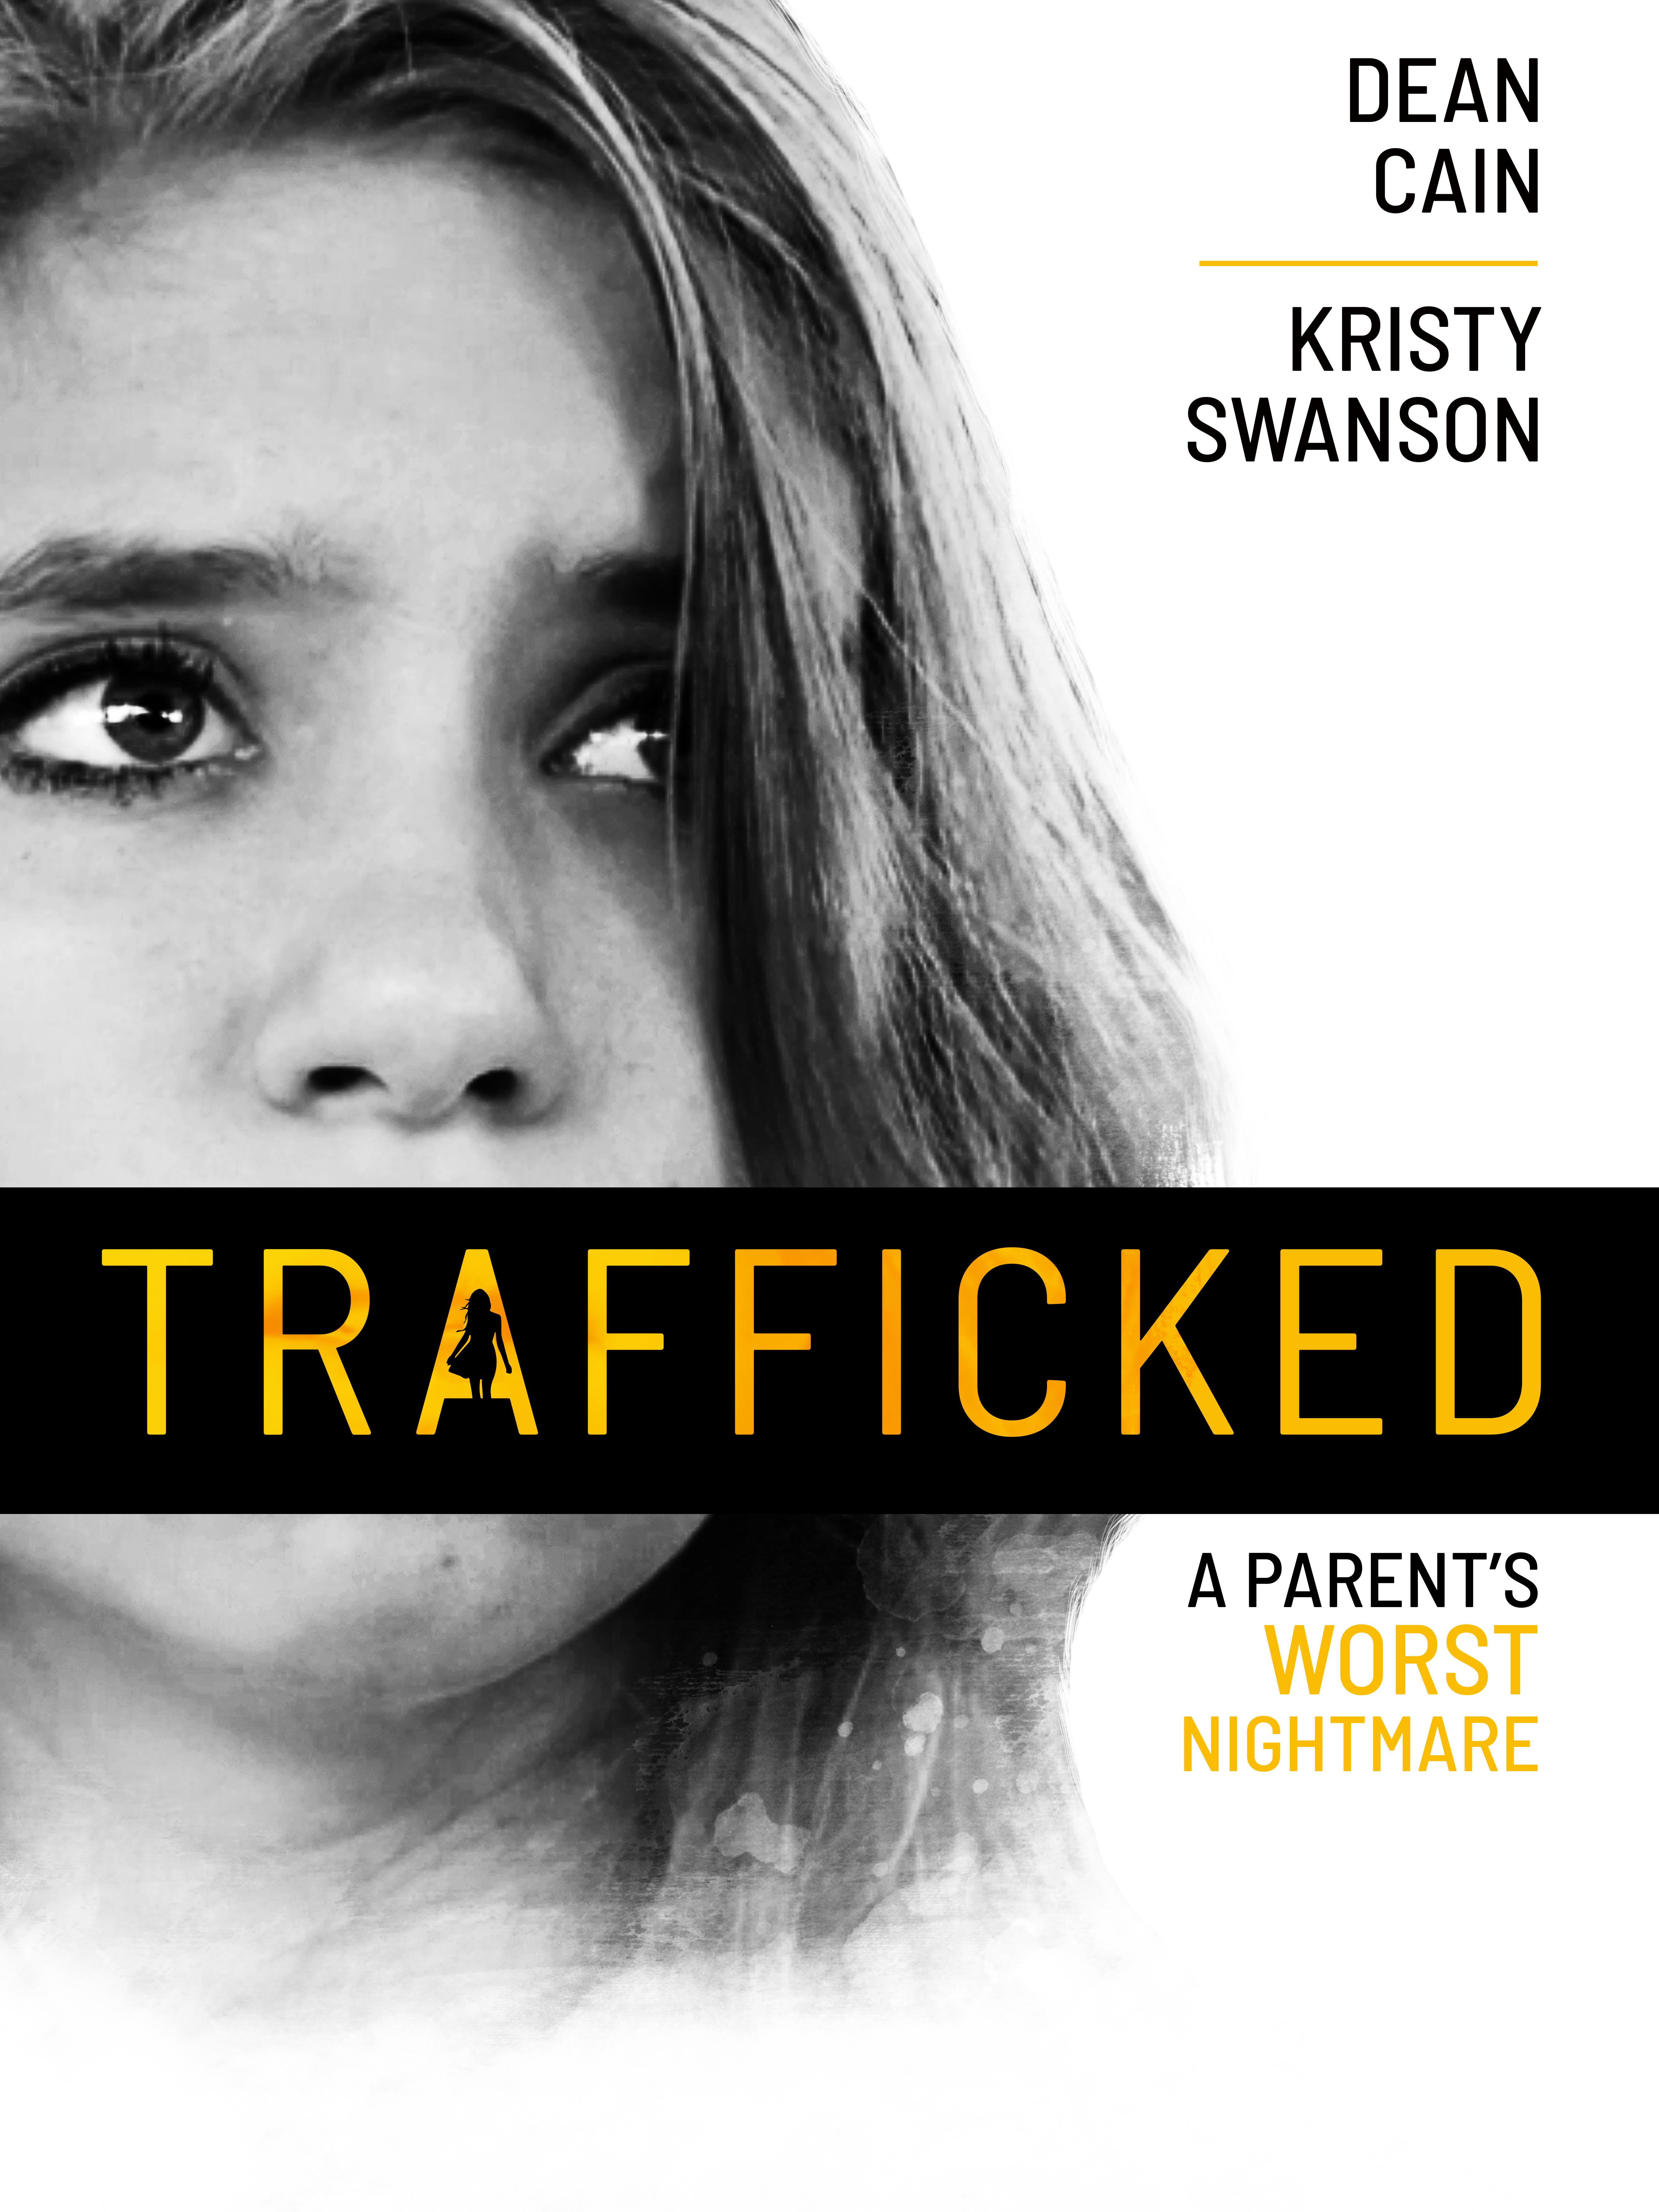 A Parent's Worst Nightmare